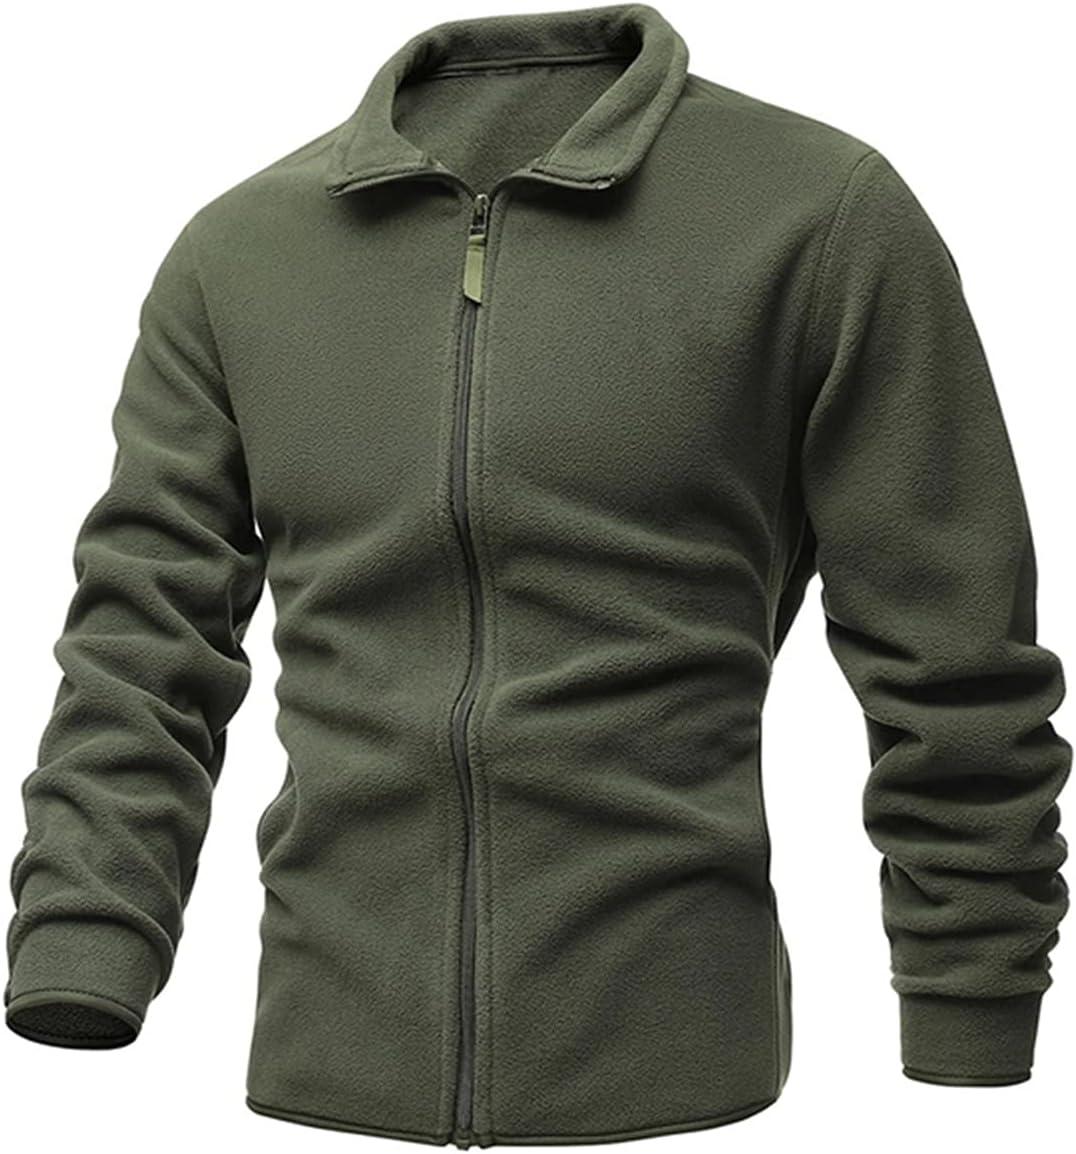 PJRYC Men's Jacket Slim Double-Faced Fleece Sweater Casual Warm Winter Coat (Color : Green, Size : A)